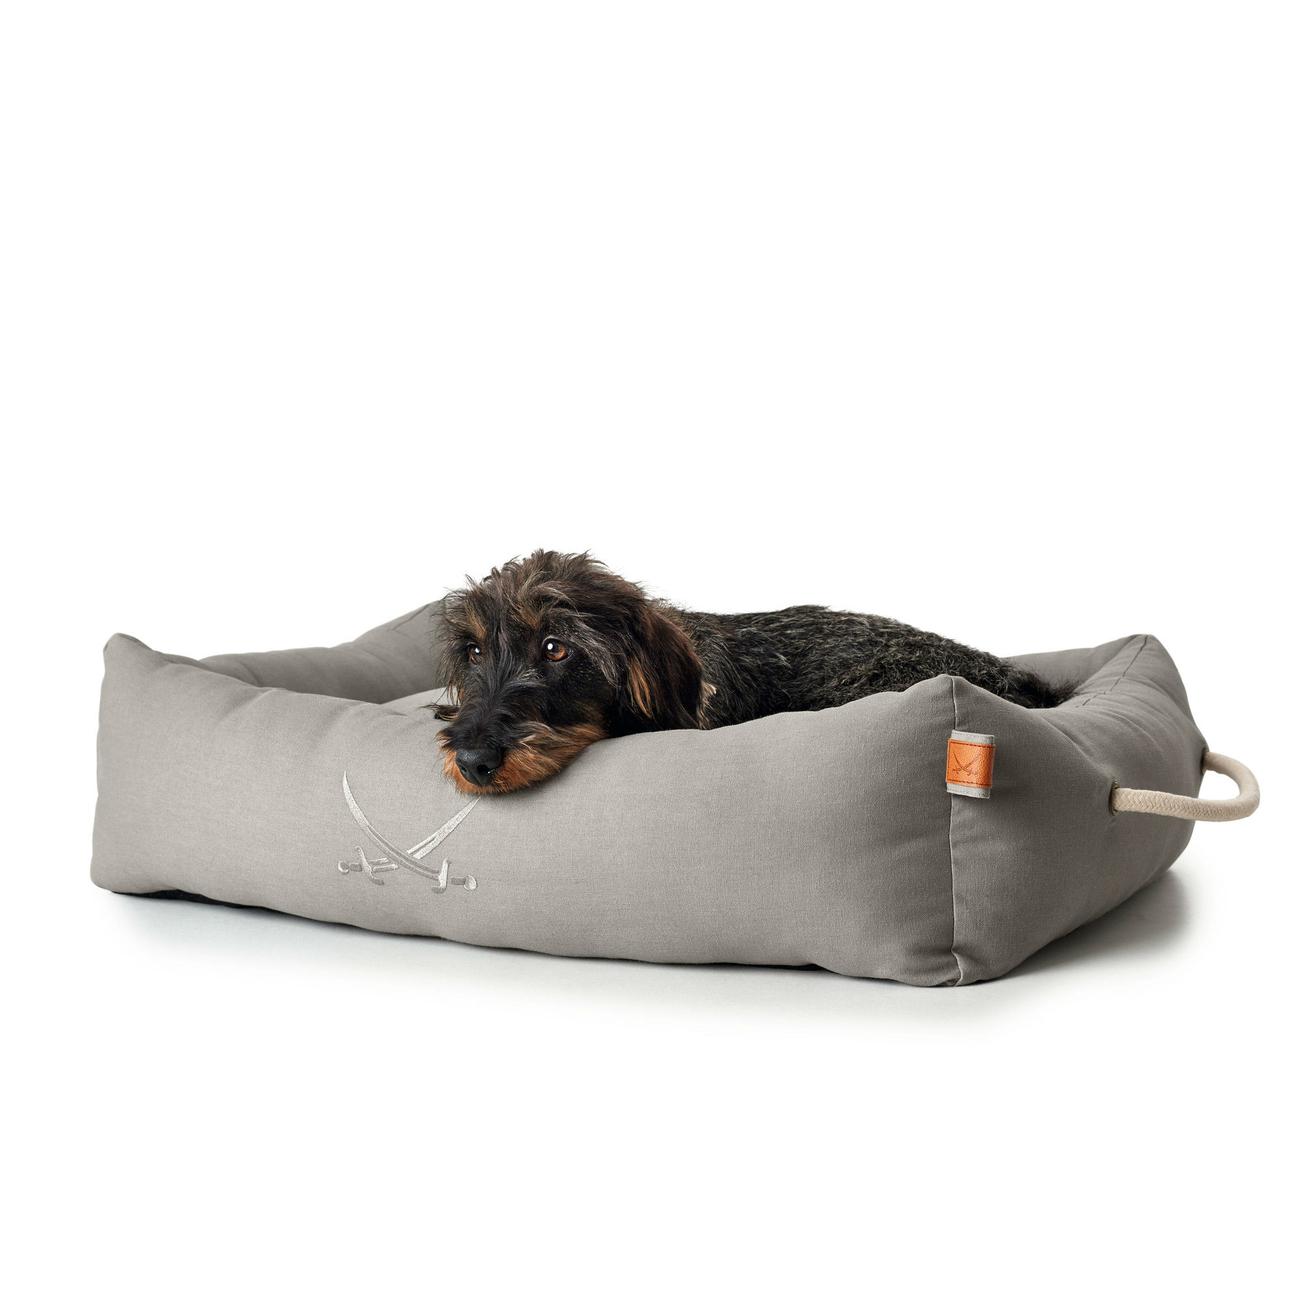 Hunter Hundesofa Sansibar Rantum 65652, Bild 6